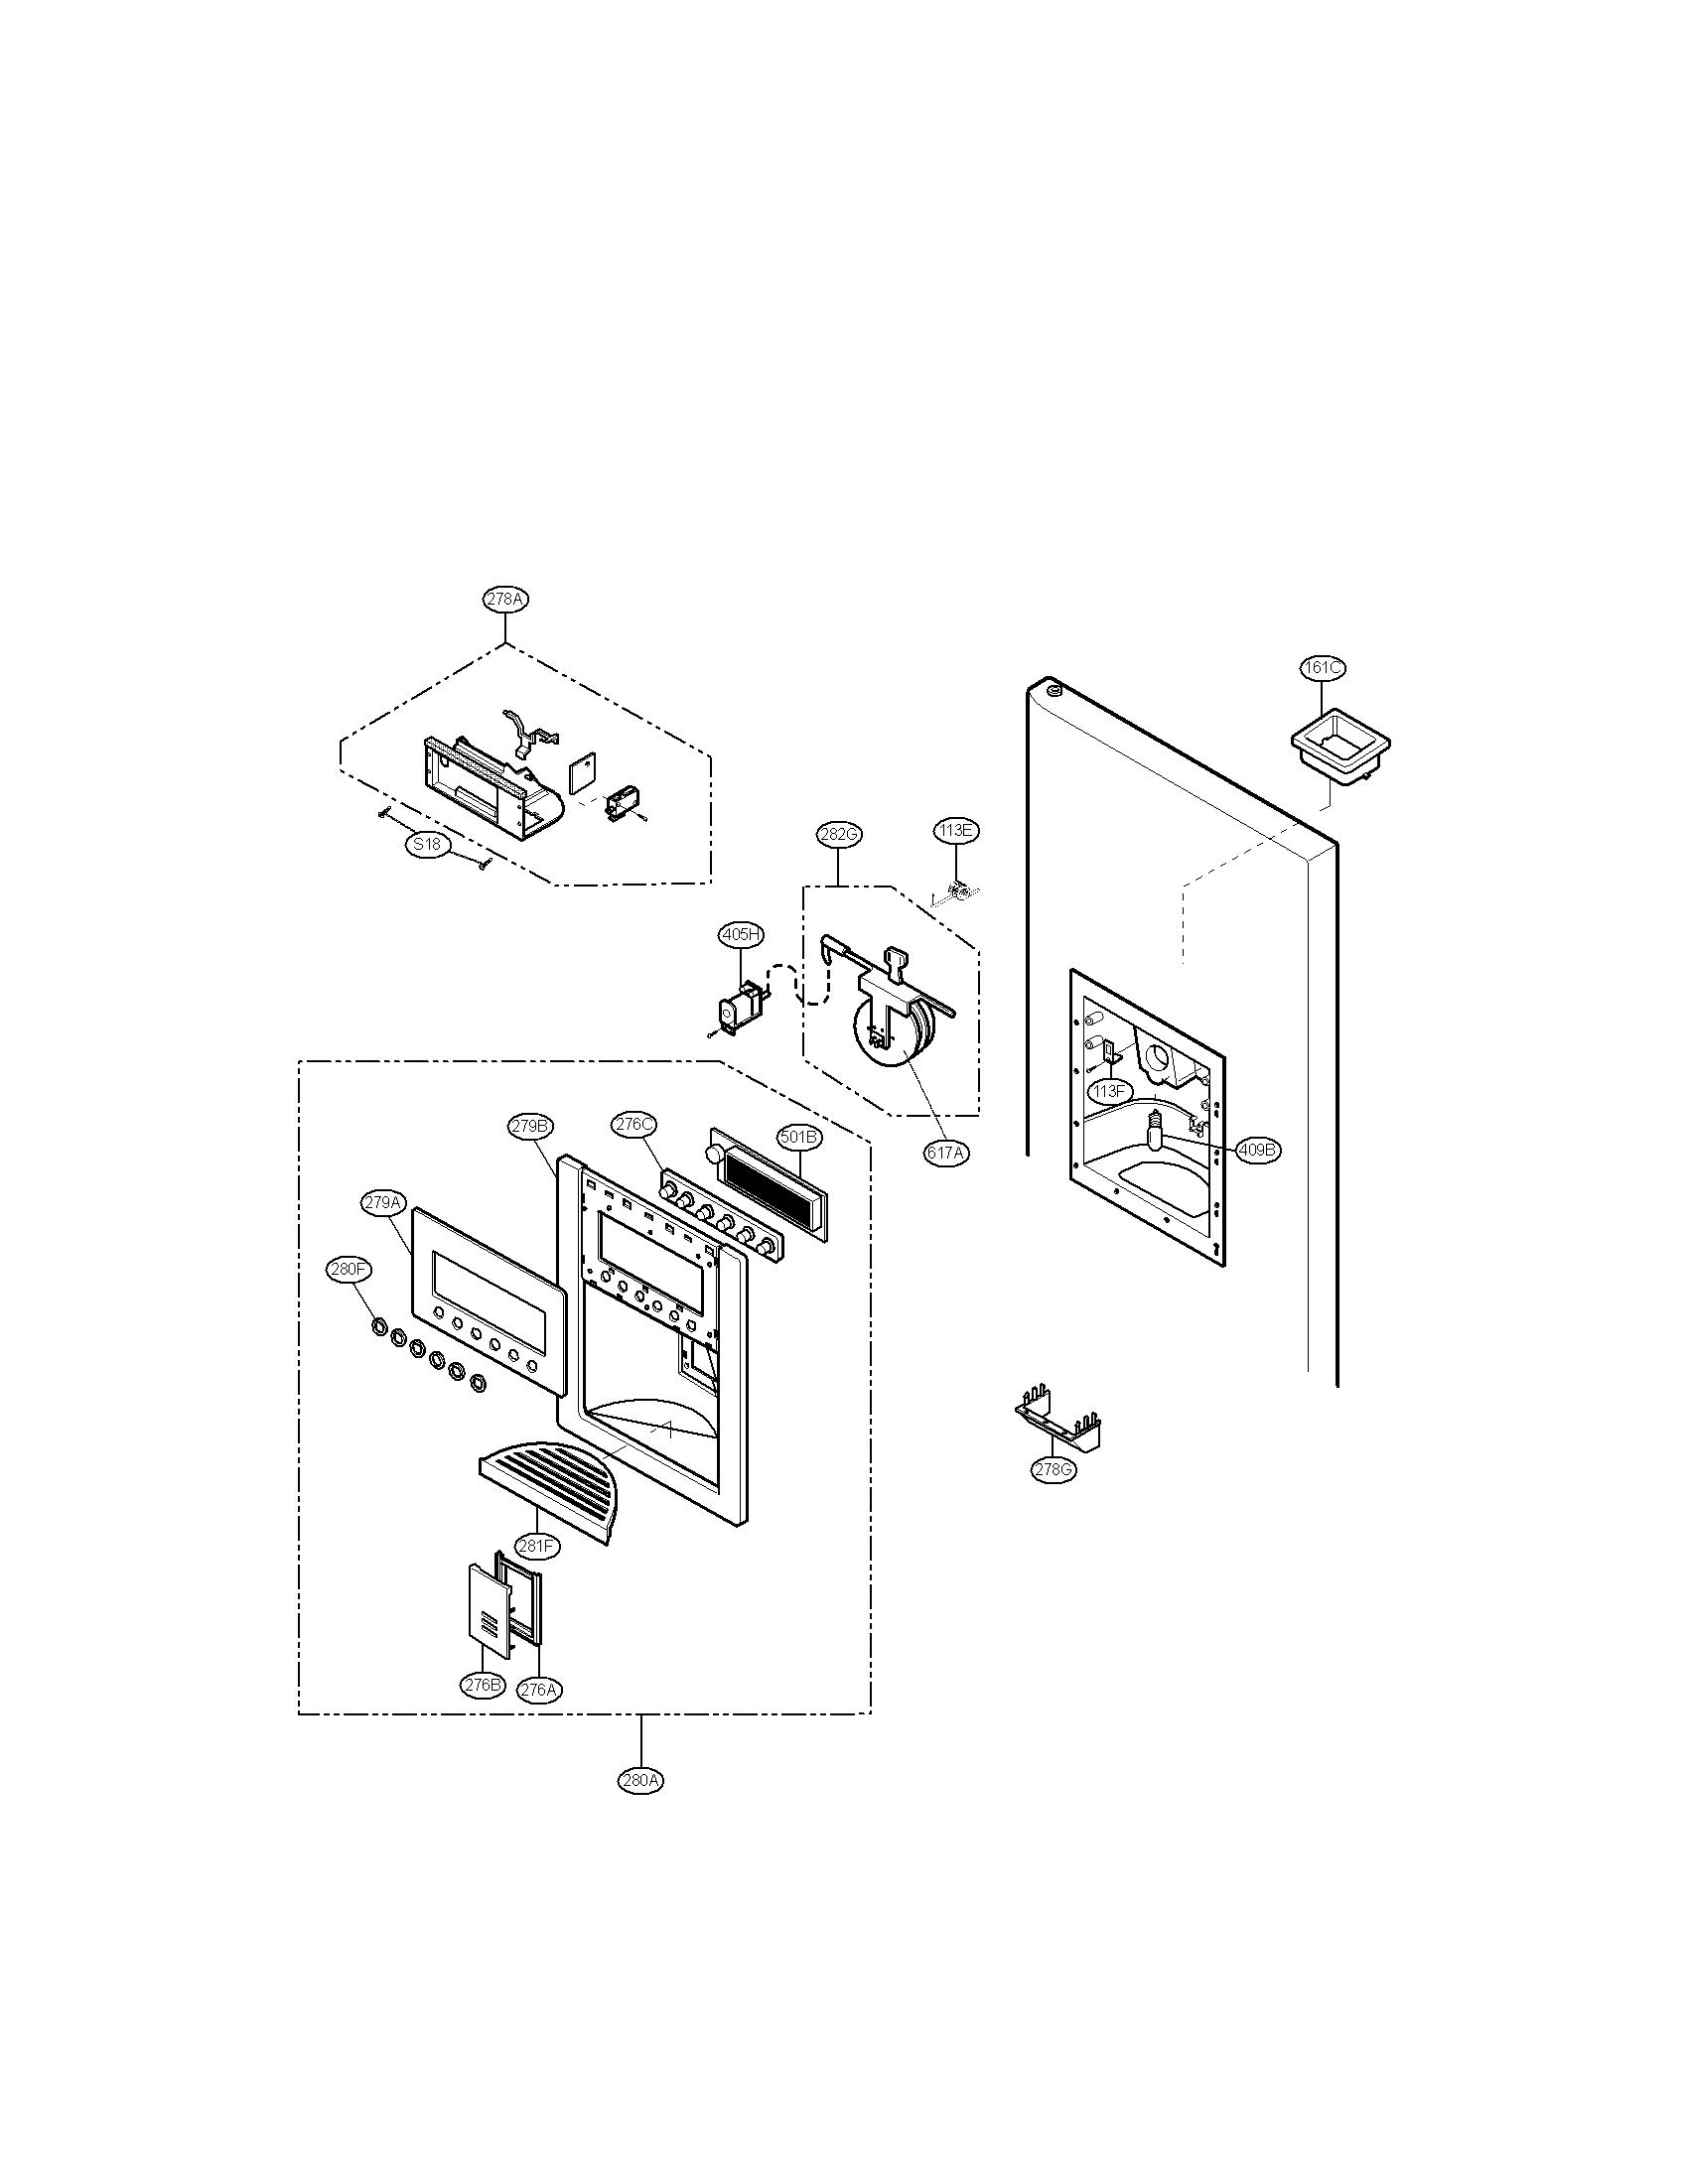 Lg model LRSC26925SW side-by-side refrigerator genuine parts